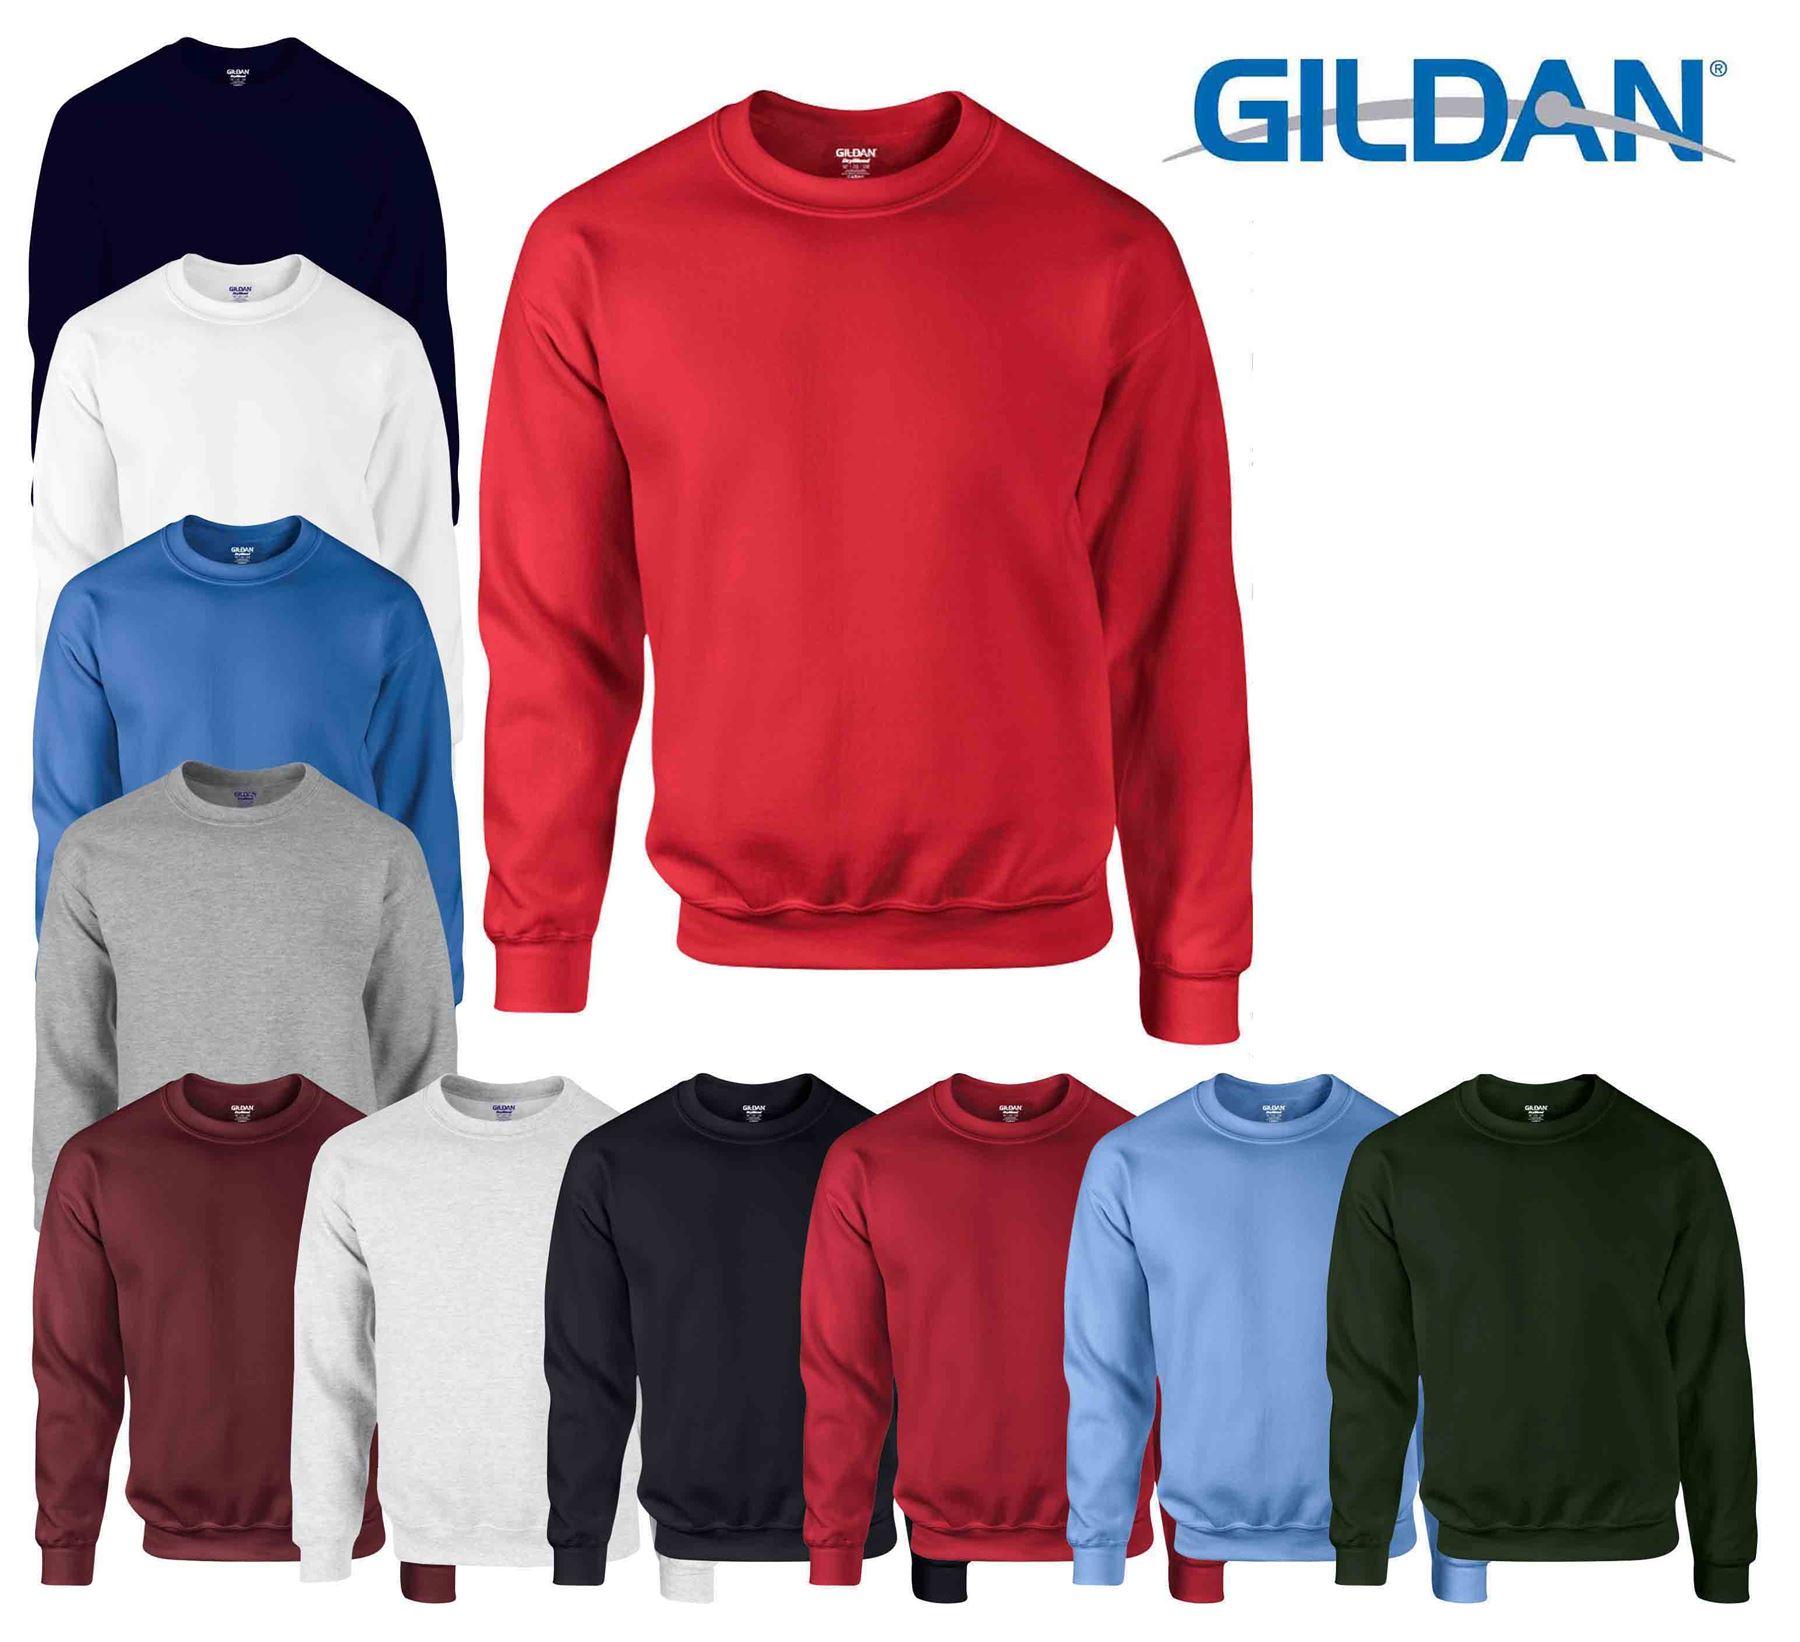 2XL Gildan DryBlend® Adult Crew Neck Sweatshirt Softer Feel Jersey Jumper TOP S